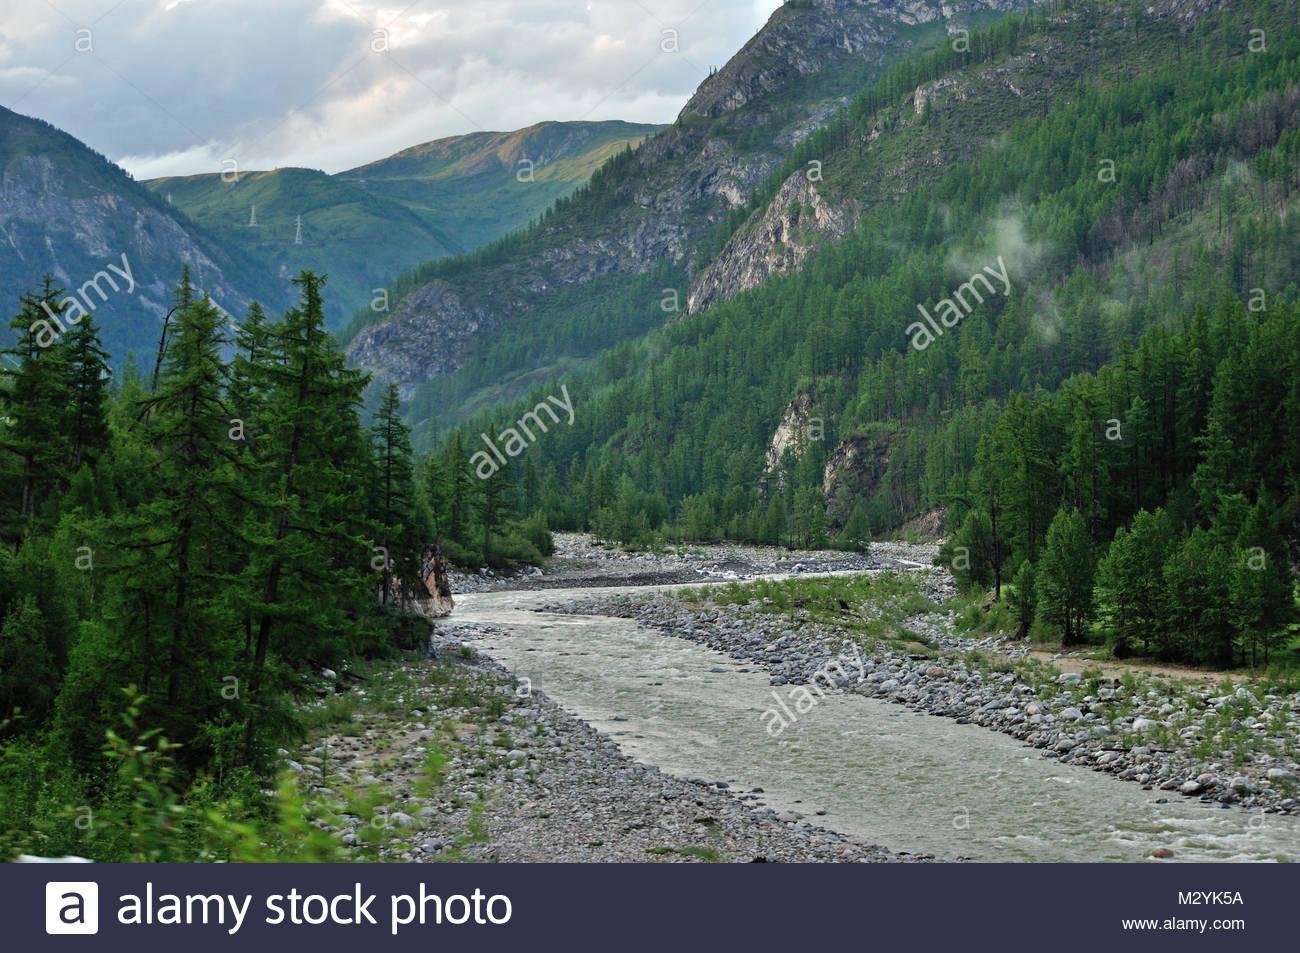 East Sayan, river 'Irkut' - Stock Image